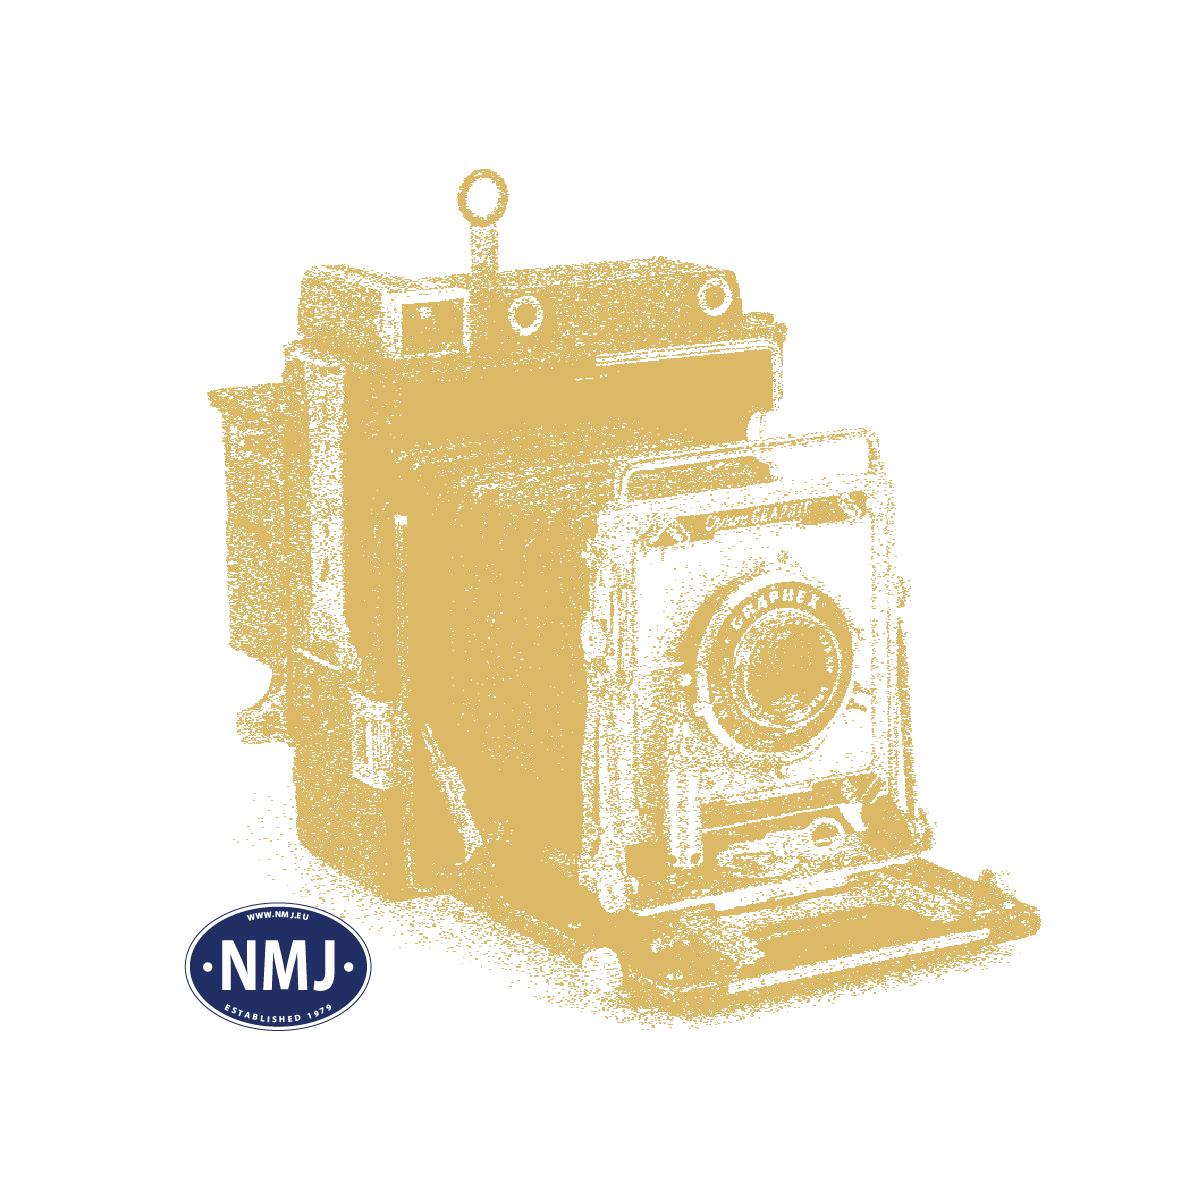 WODJP5680 - Just Plug Forgrener Med Sekvensstyring